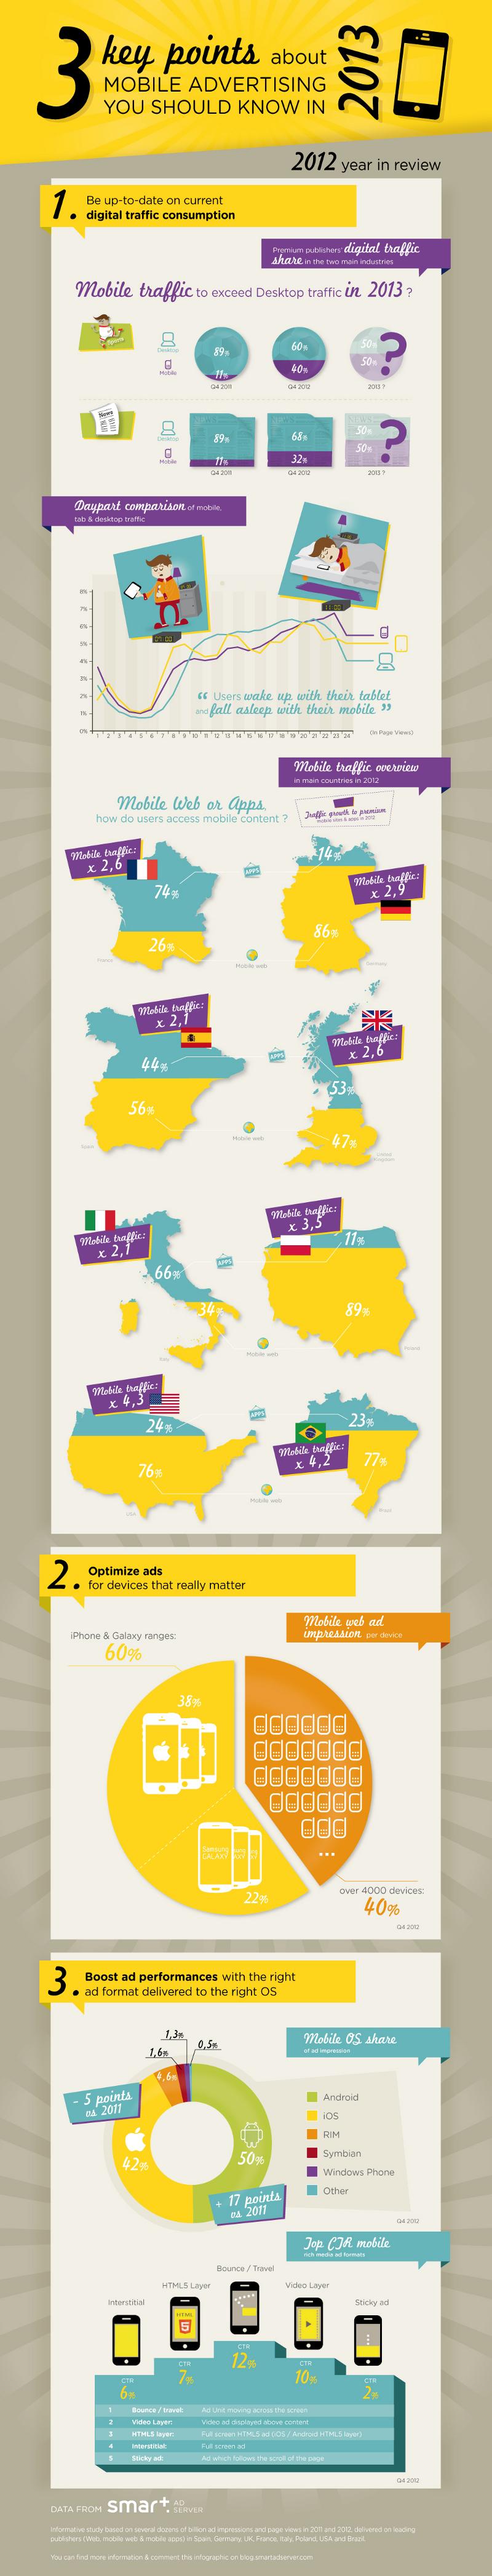 Mobile-Advertising-Statistics